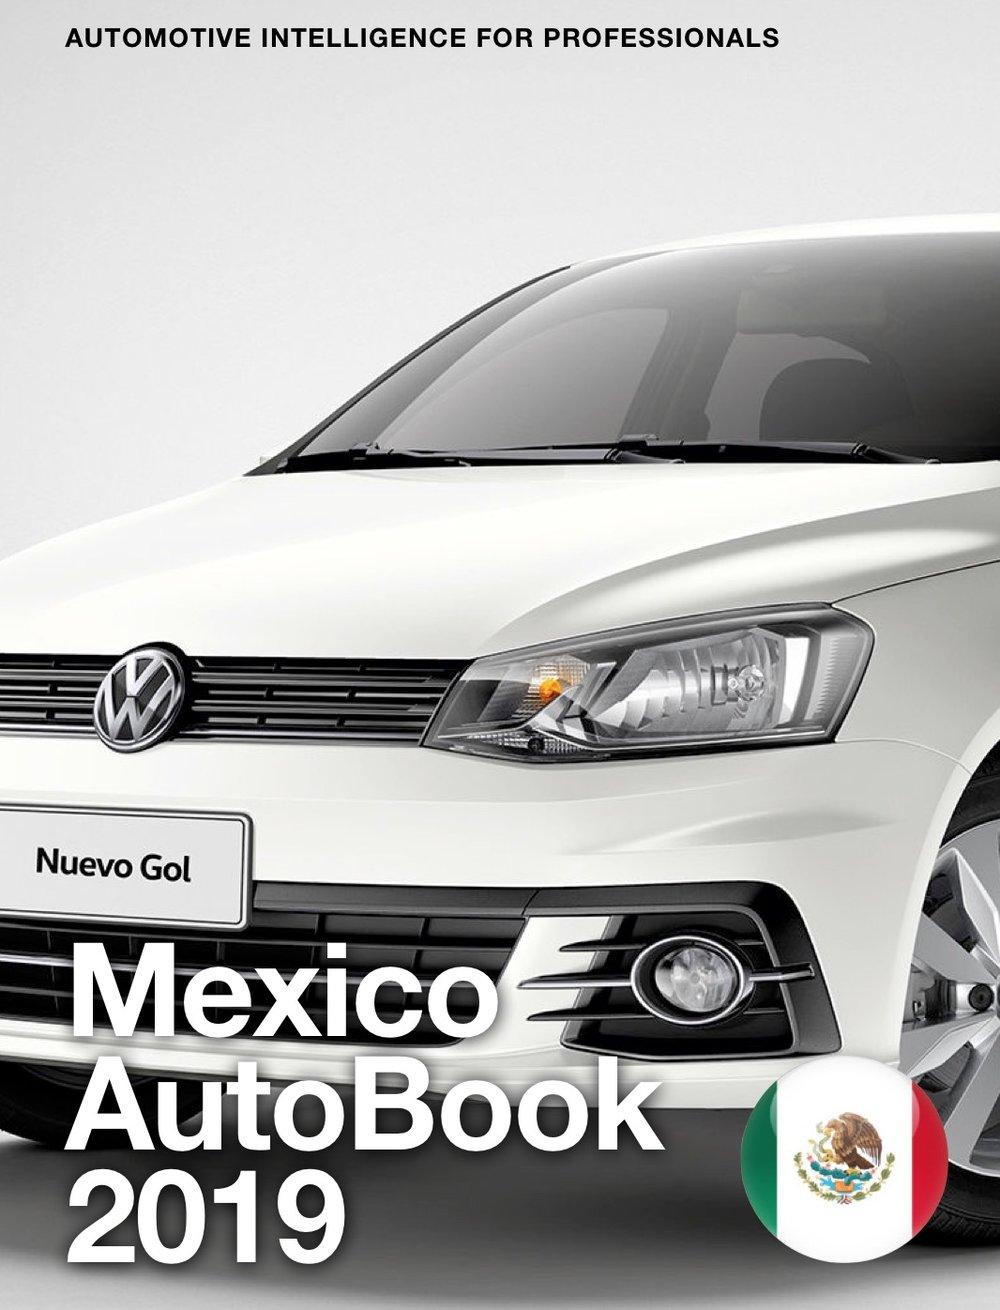 Mexico AutoBook 2018 1026x1340.jpg